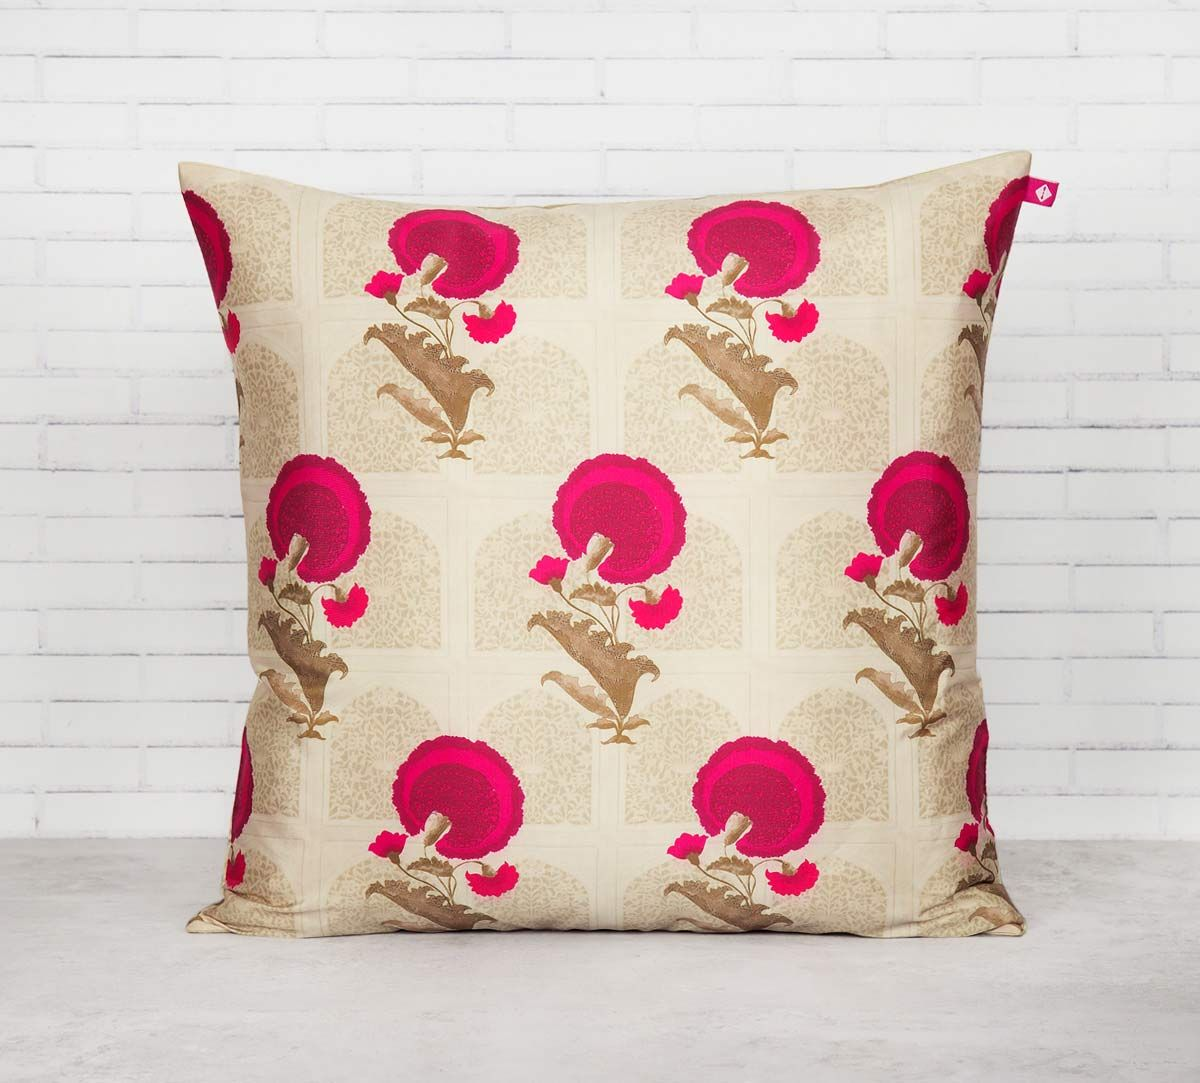 India Circus Flower Regalia Blended Taf Silk Cushion Cover